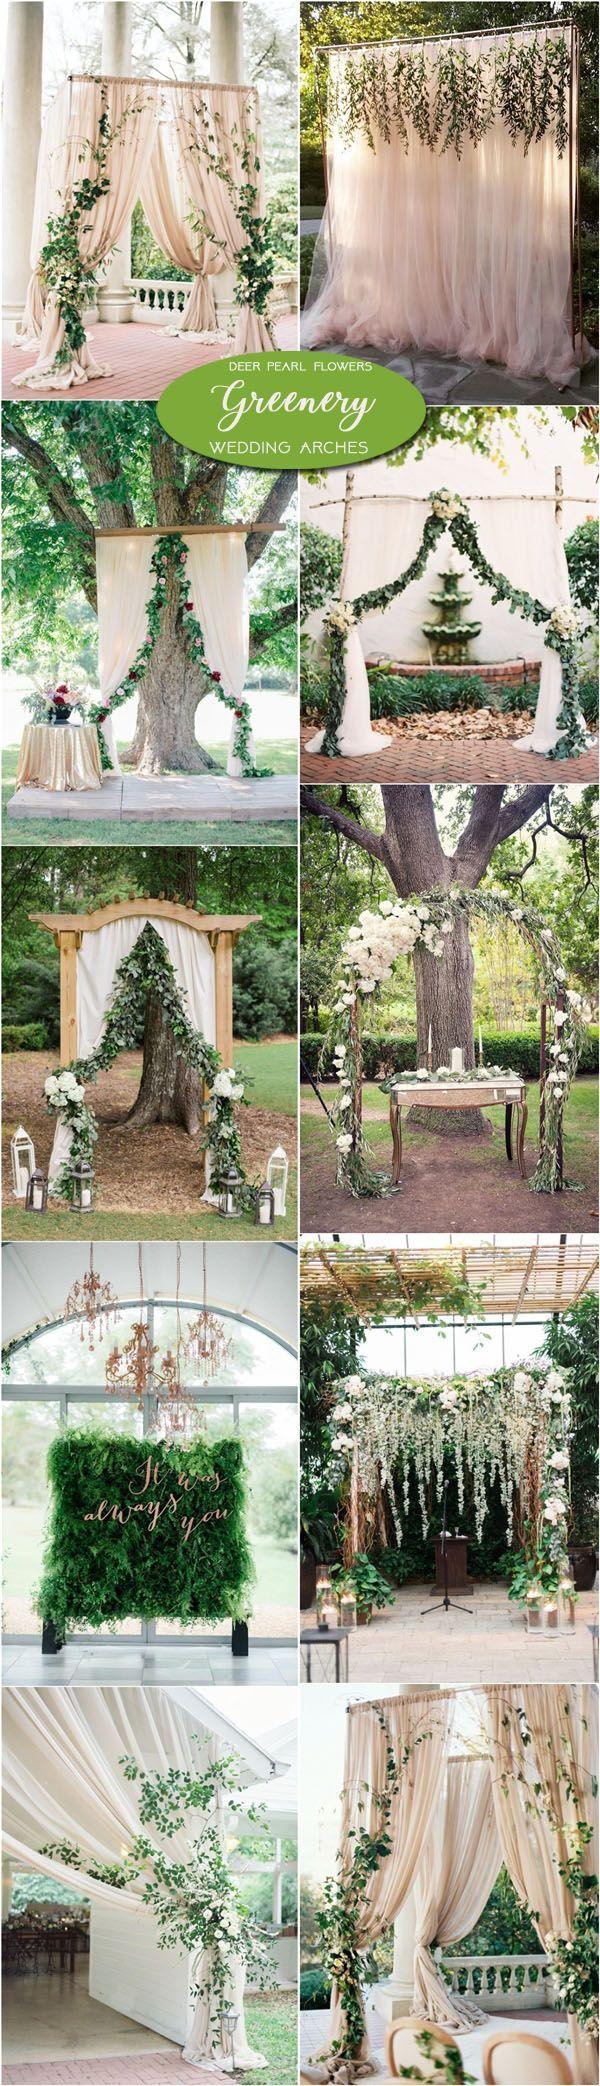 Wedding decoration ideas outside   Wedding Trends  Greenery Wedding Decor Ideas  Hitched